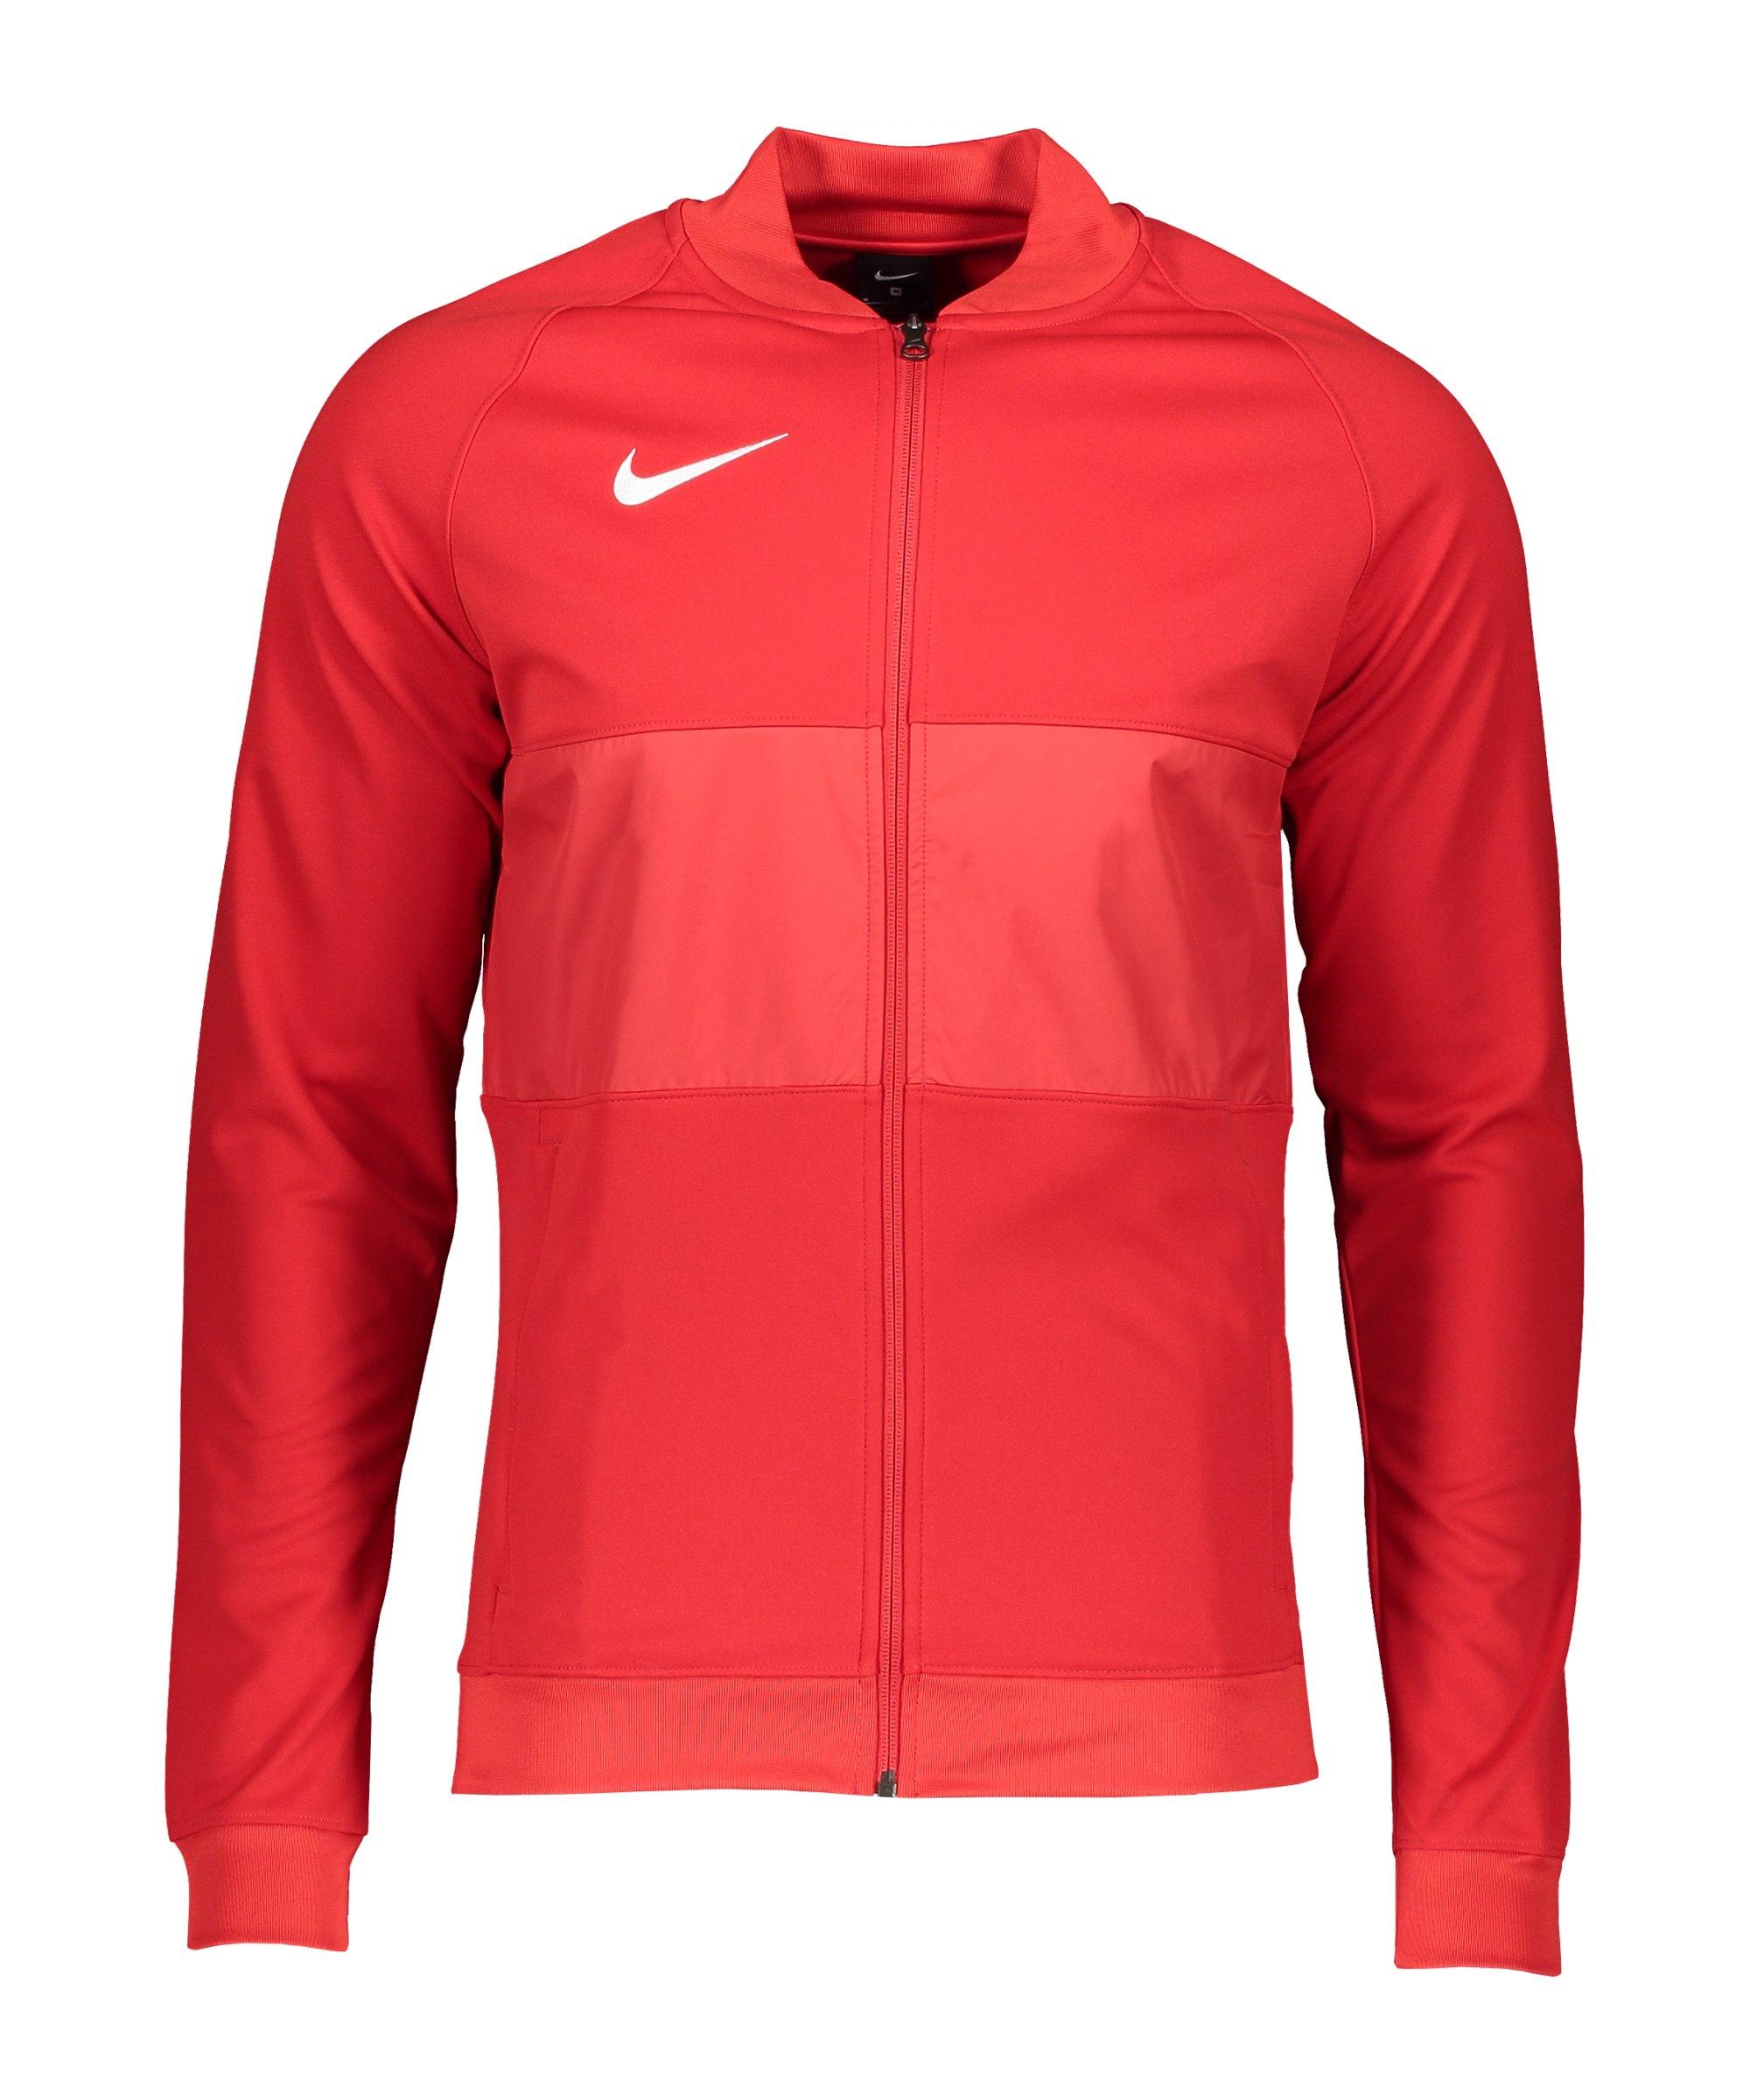 Nike Strike 21 Anthem Jacke Rot Weiss F657 - rot